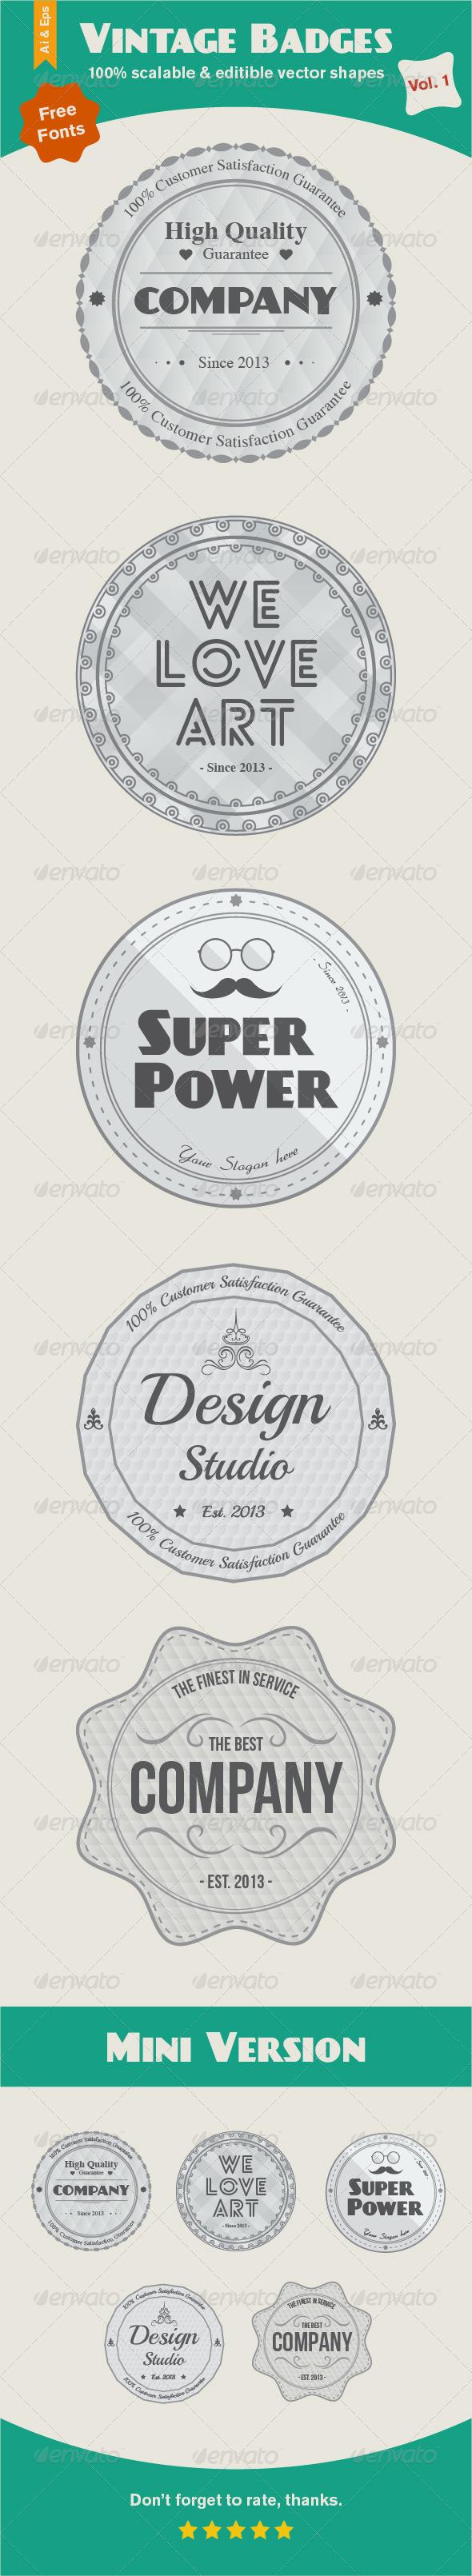 GraphicRiver Vintage Badges Vol 1 6503978